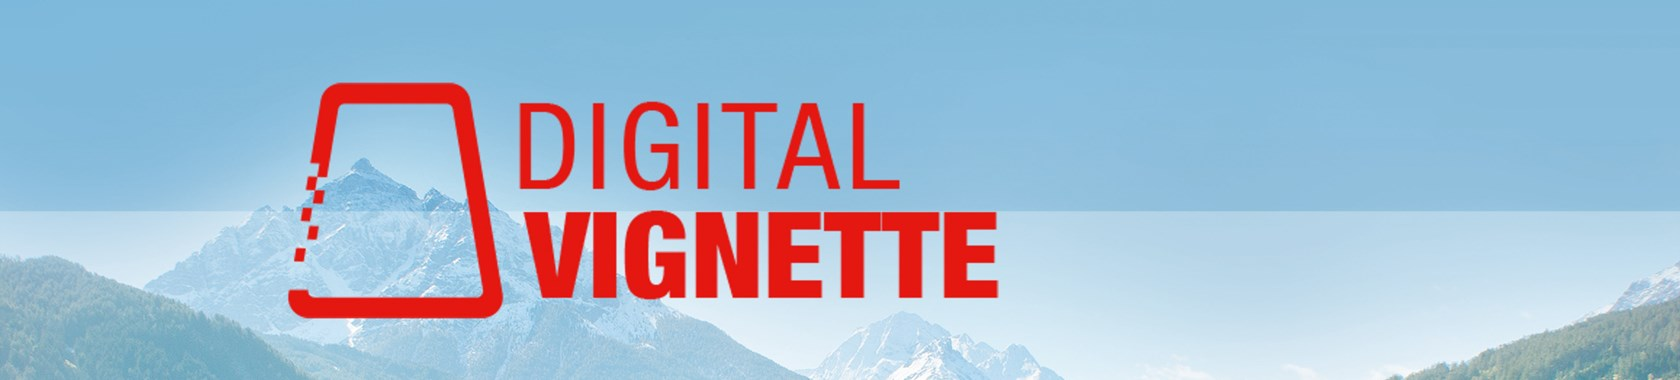 digital-vignette